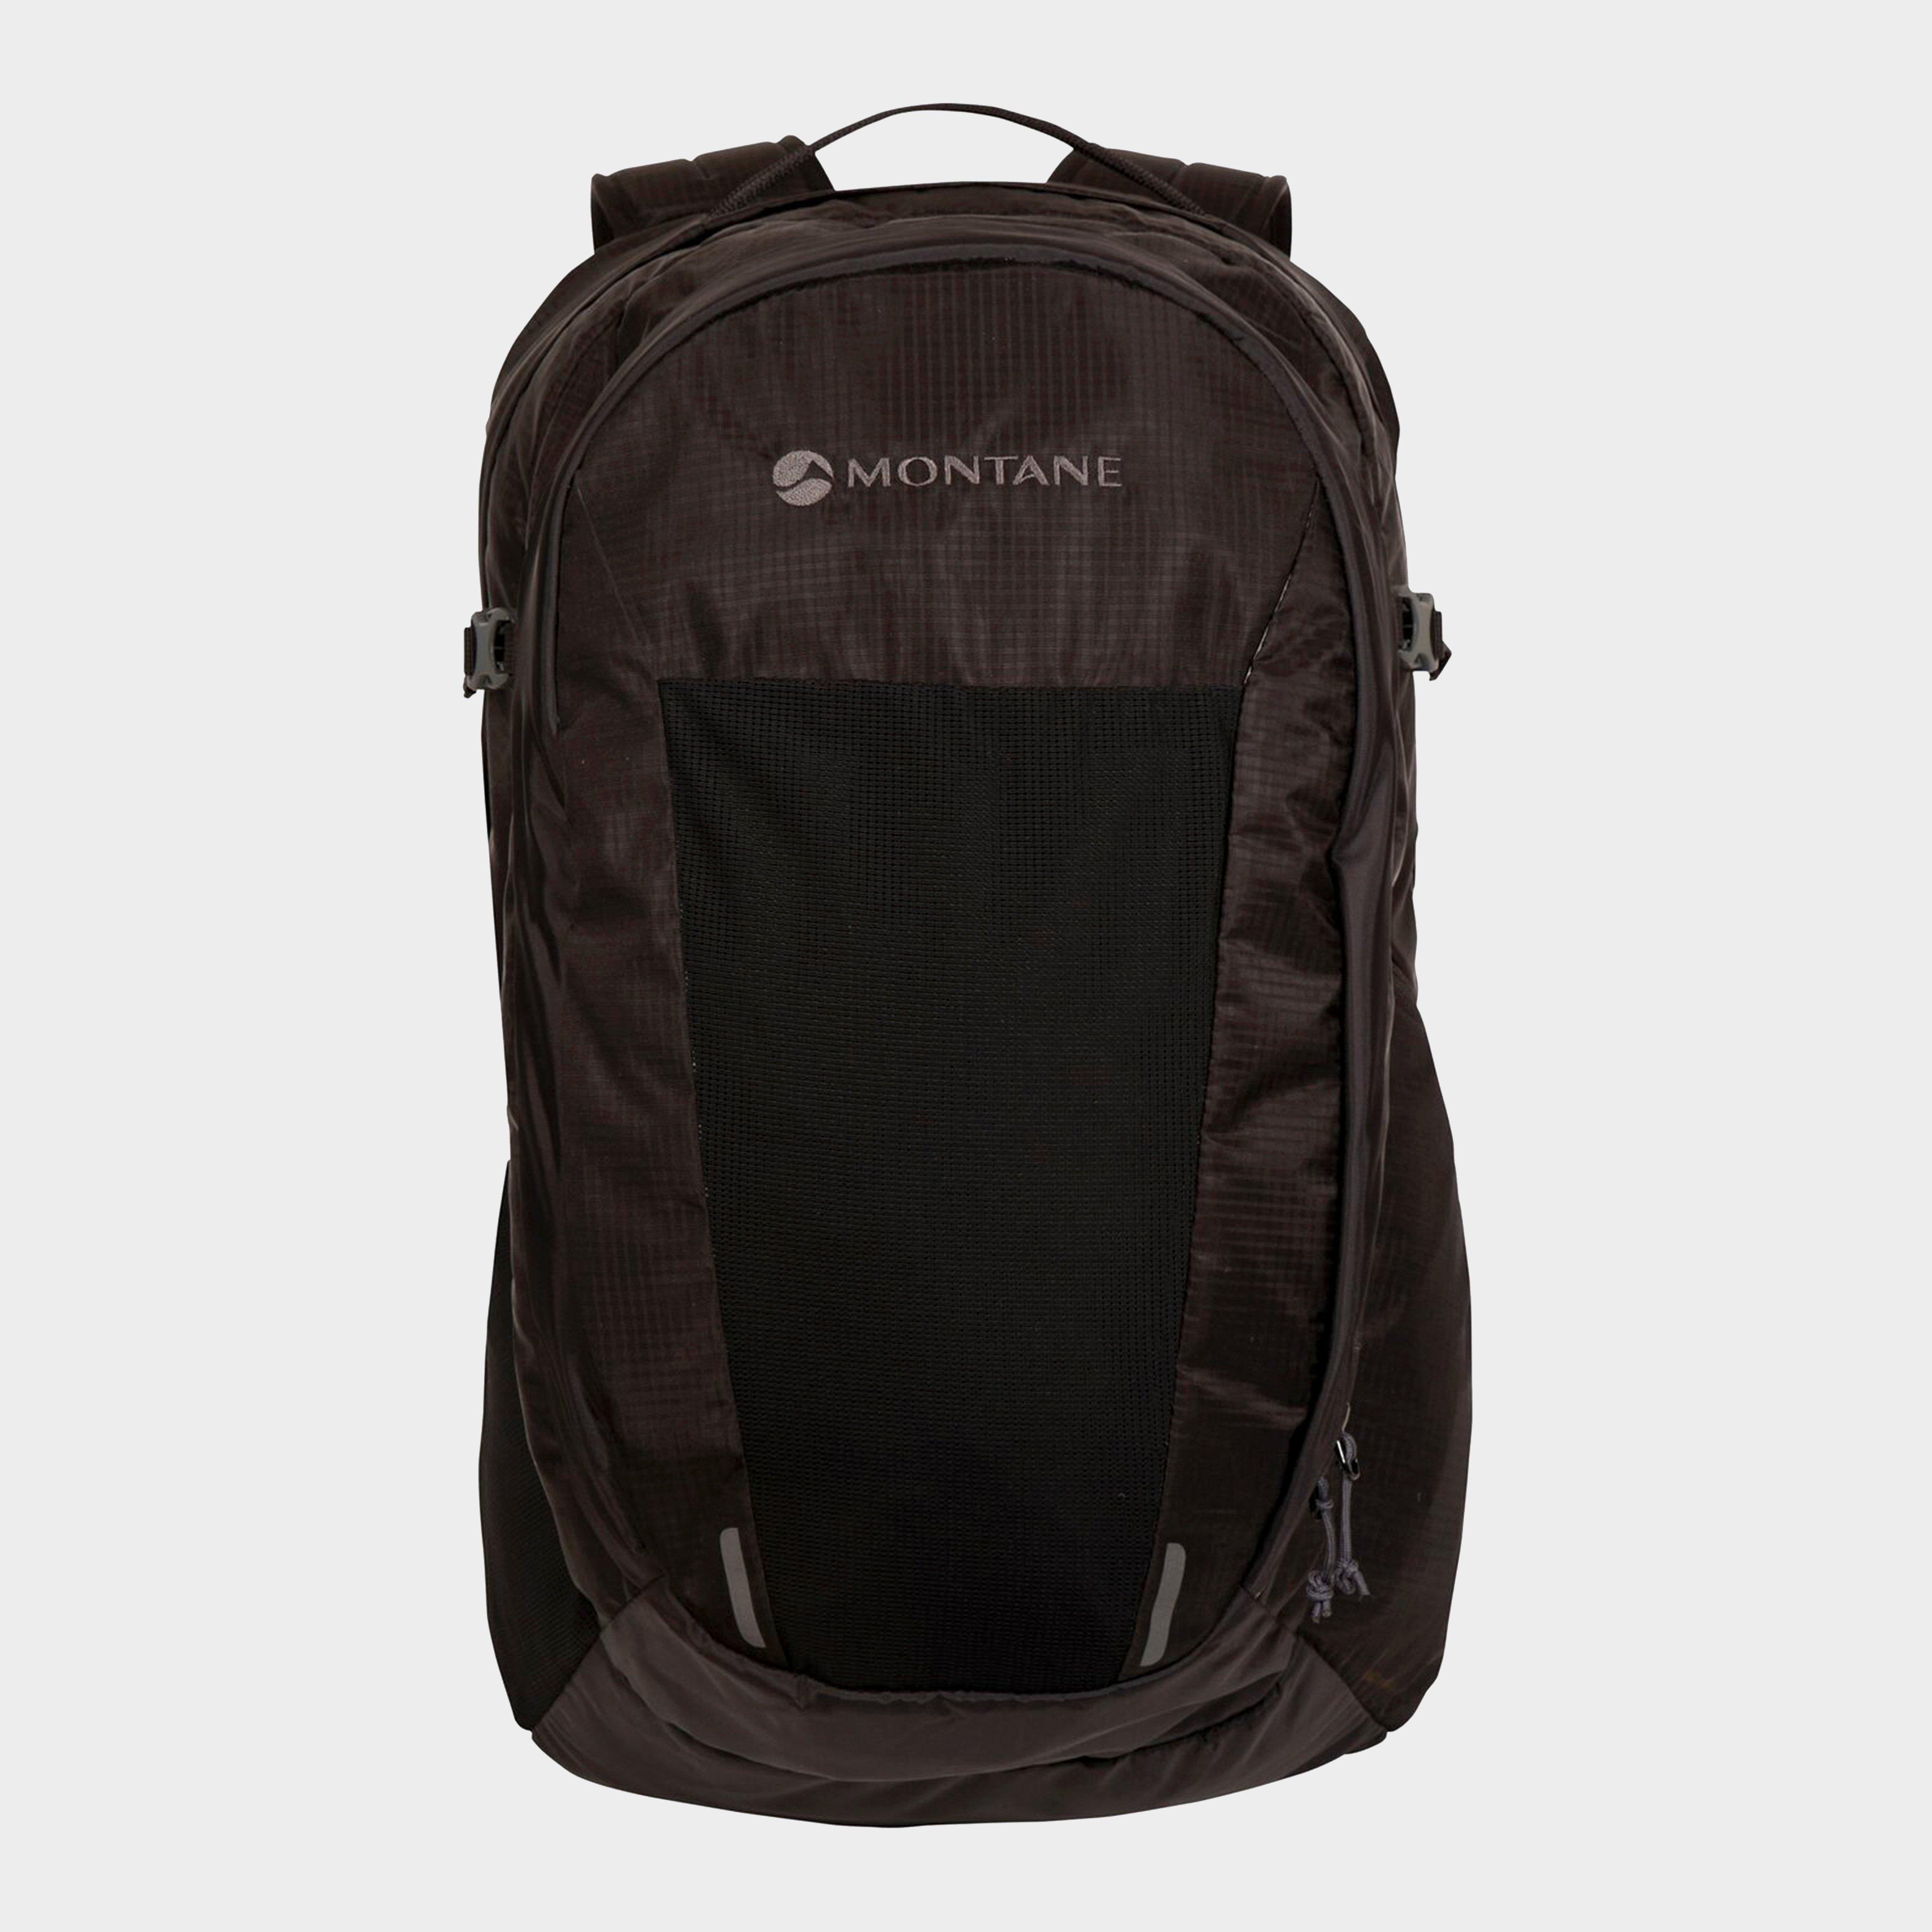 Montane Synergy 30L Backpack, Black